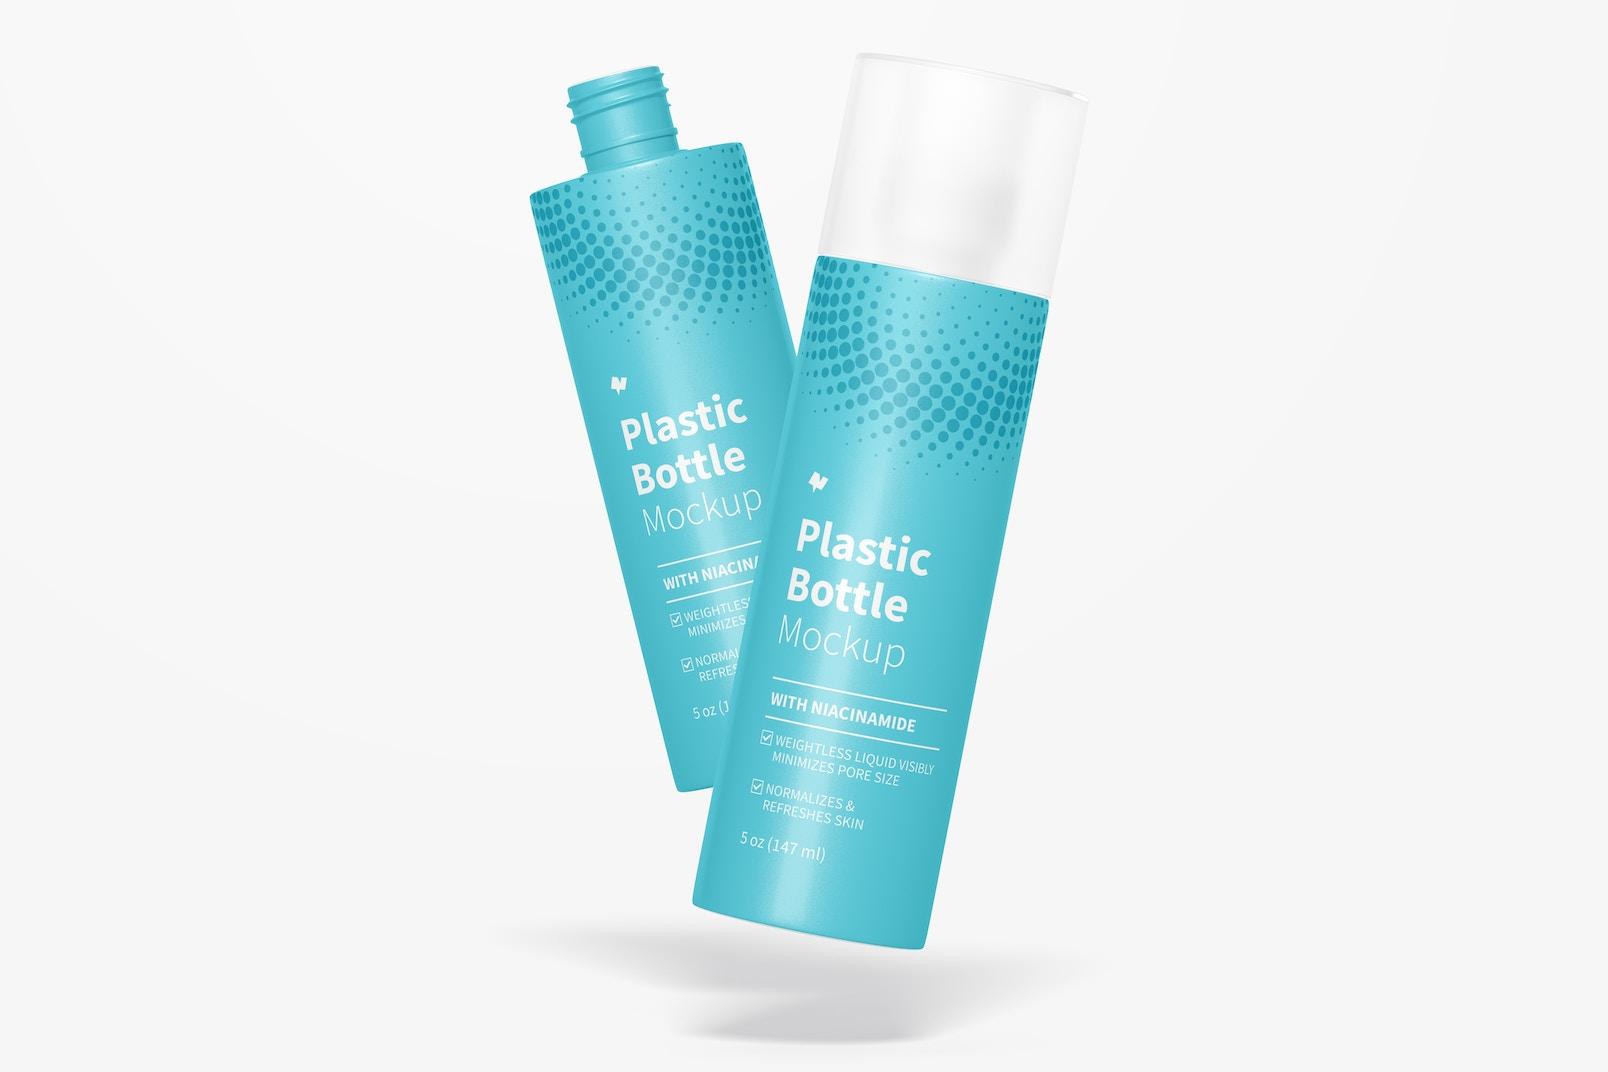 5 oz Plastic Bottles Mockup, Falling